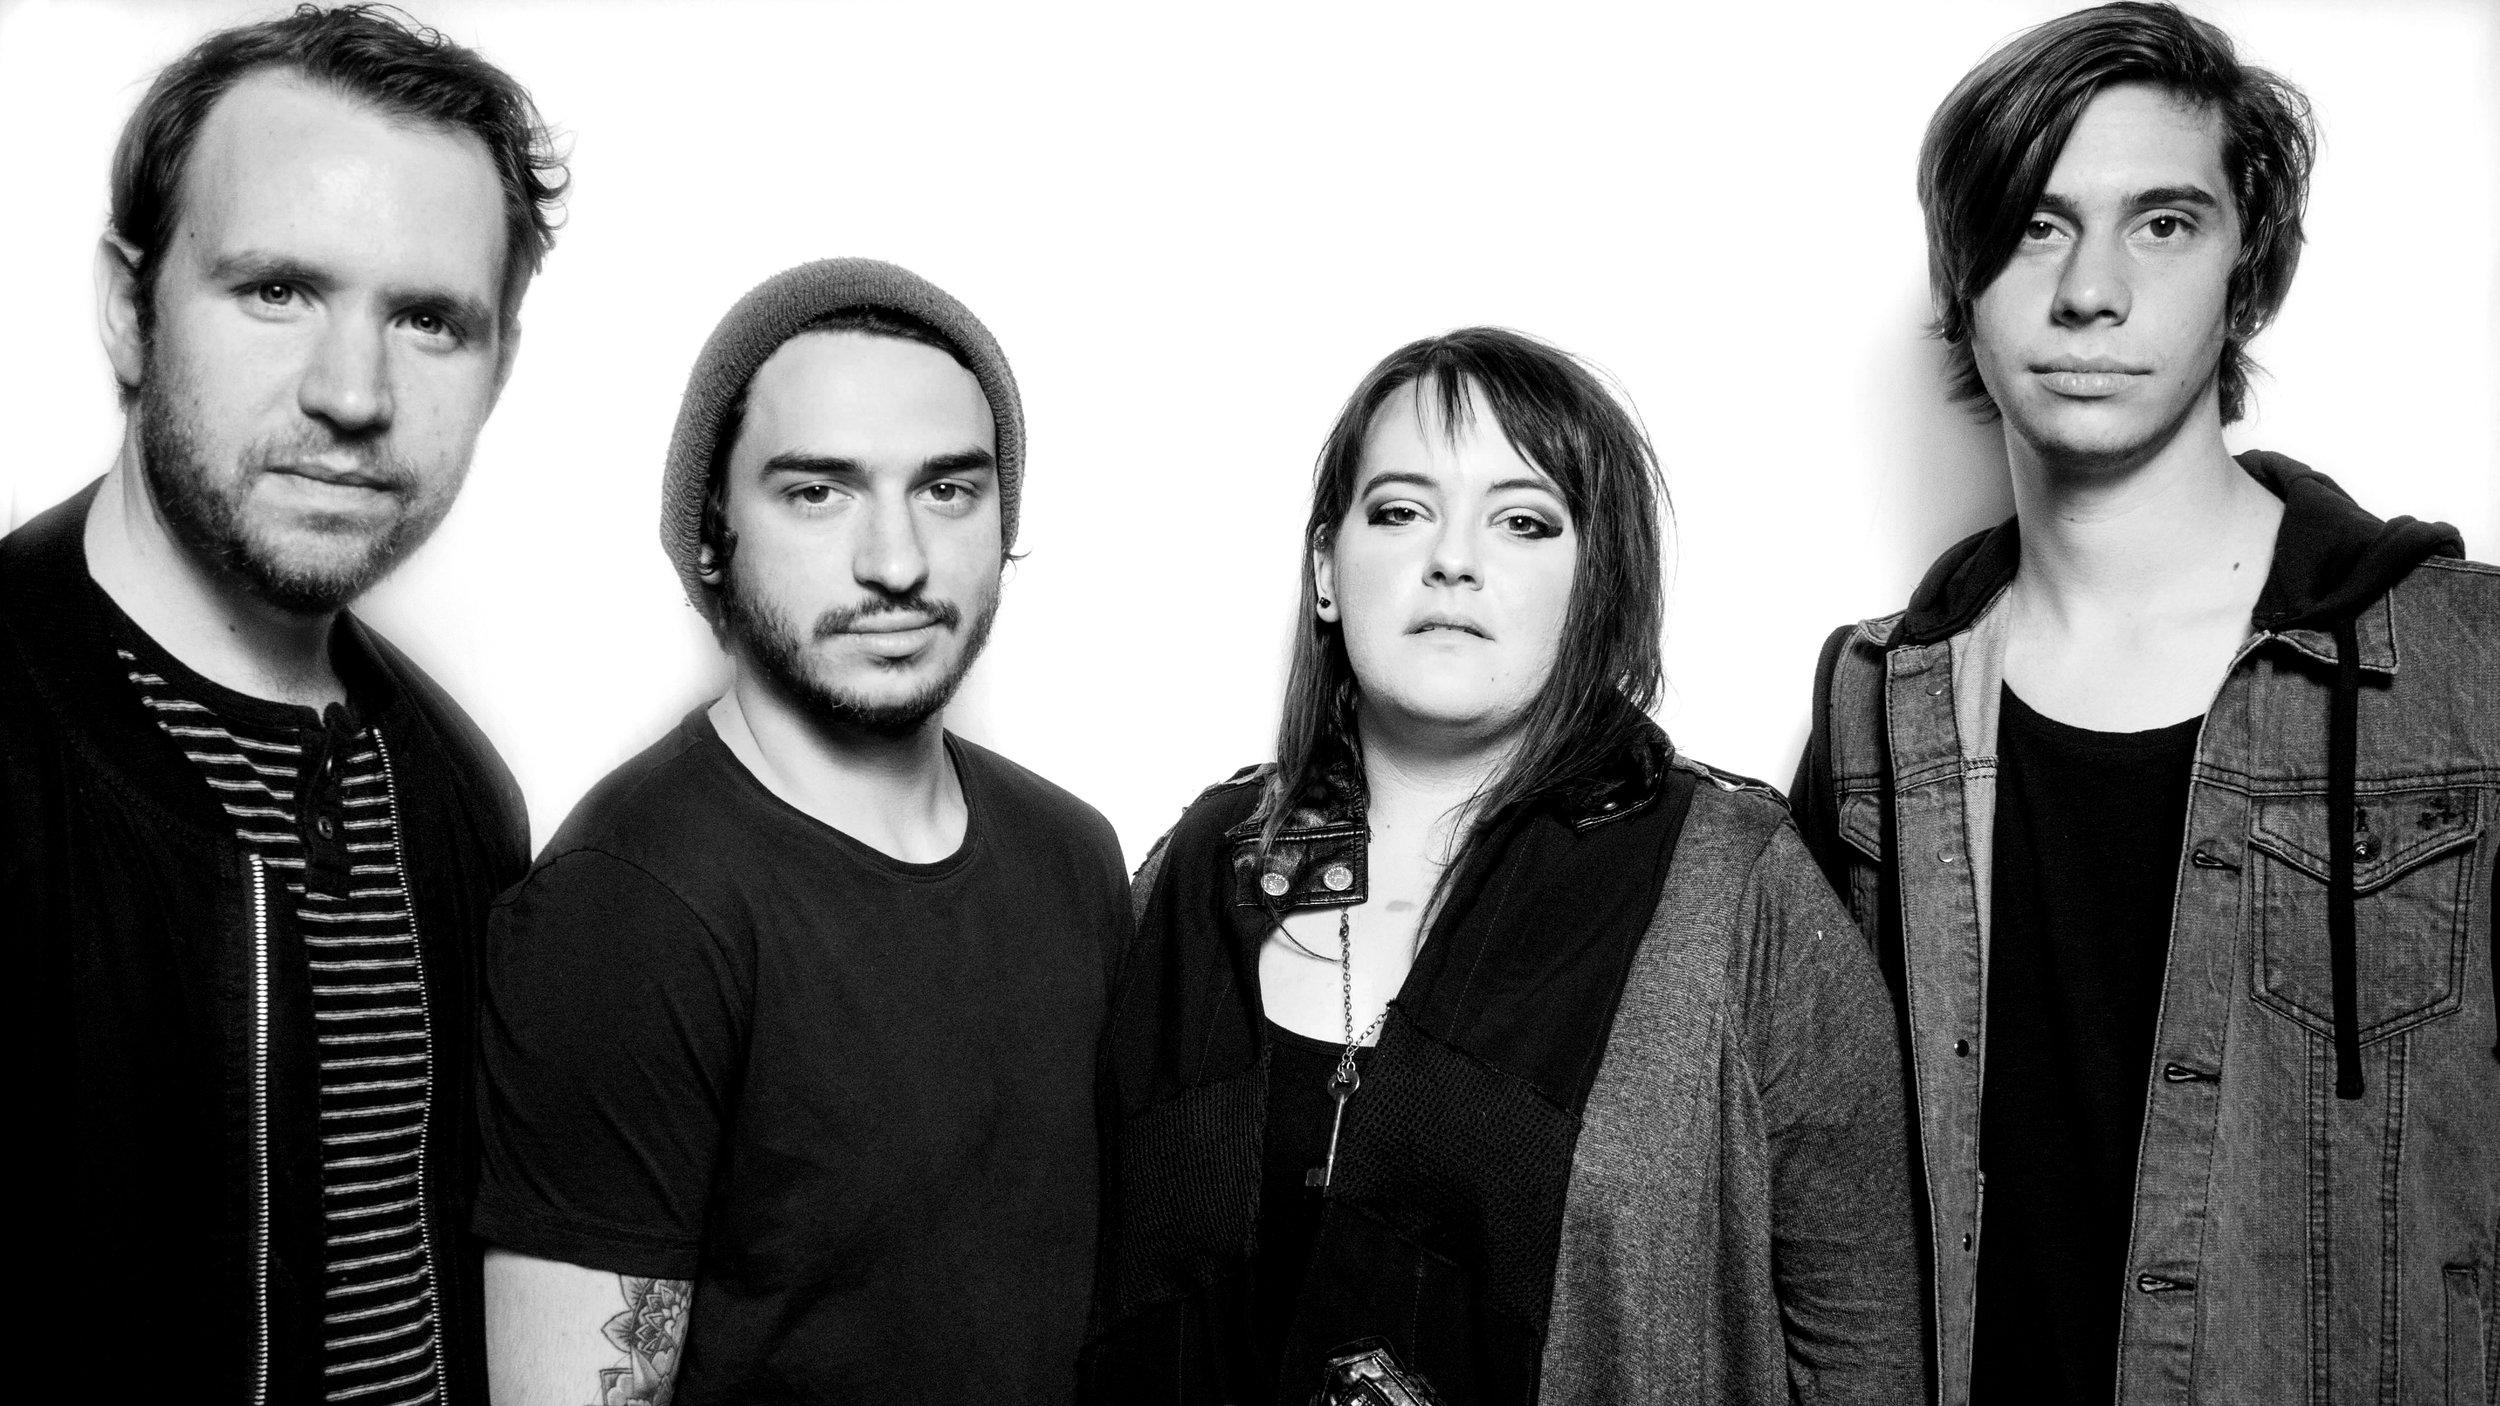 The band - Raviner